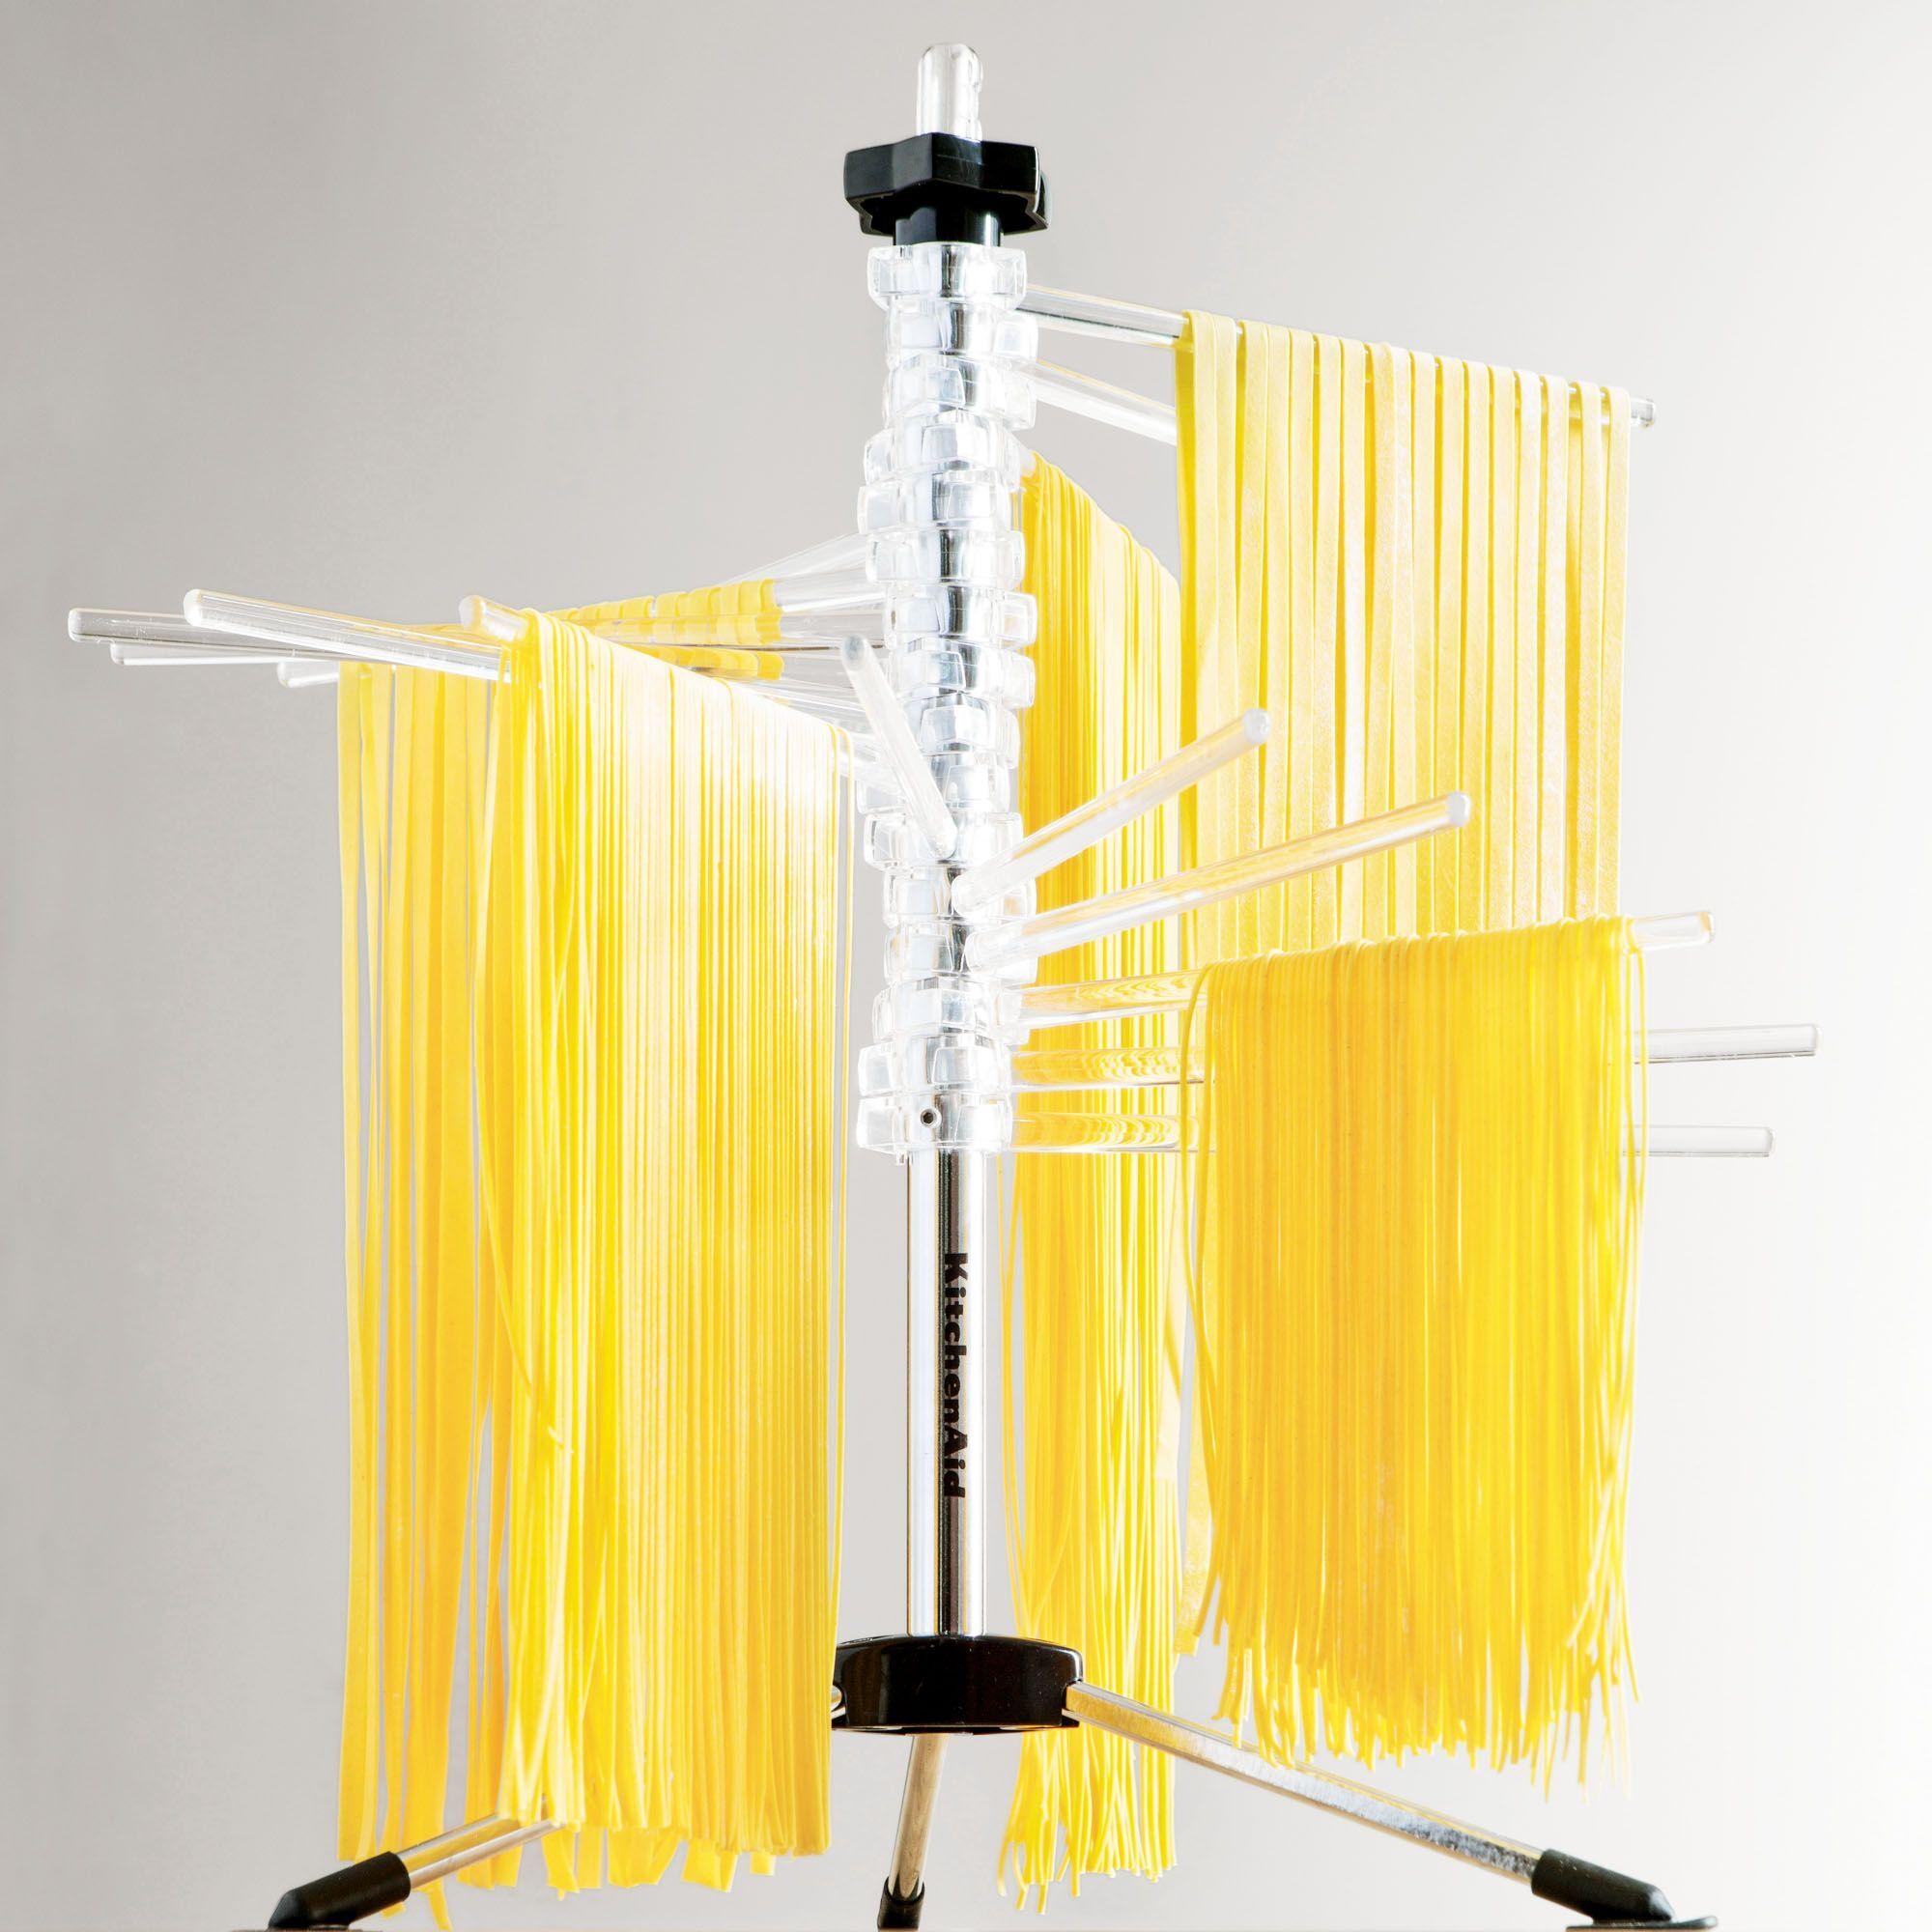 kitchenaid 5kpdr essiccatore per pasta a 16 bracci